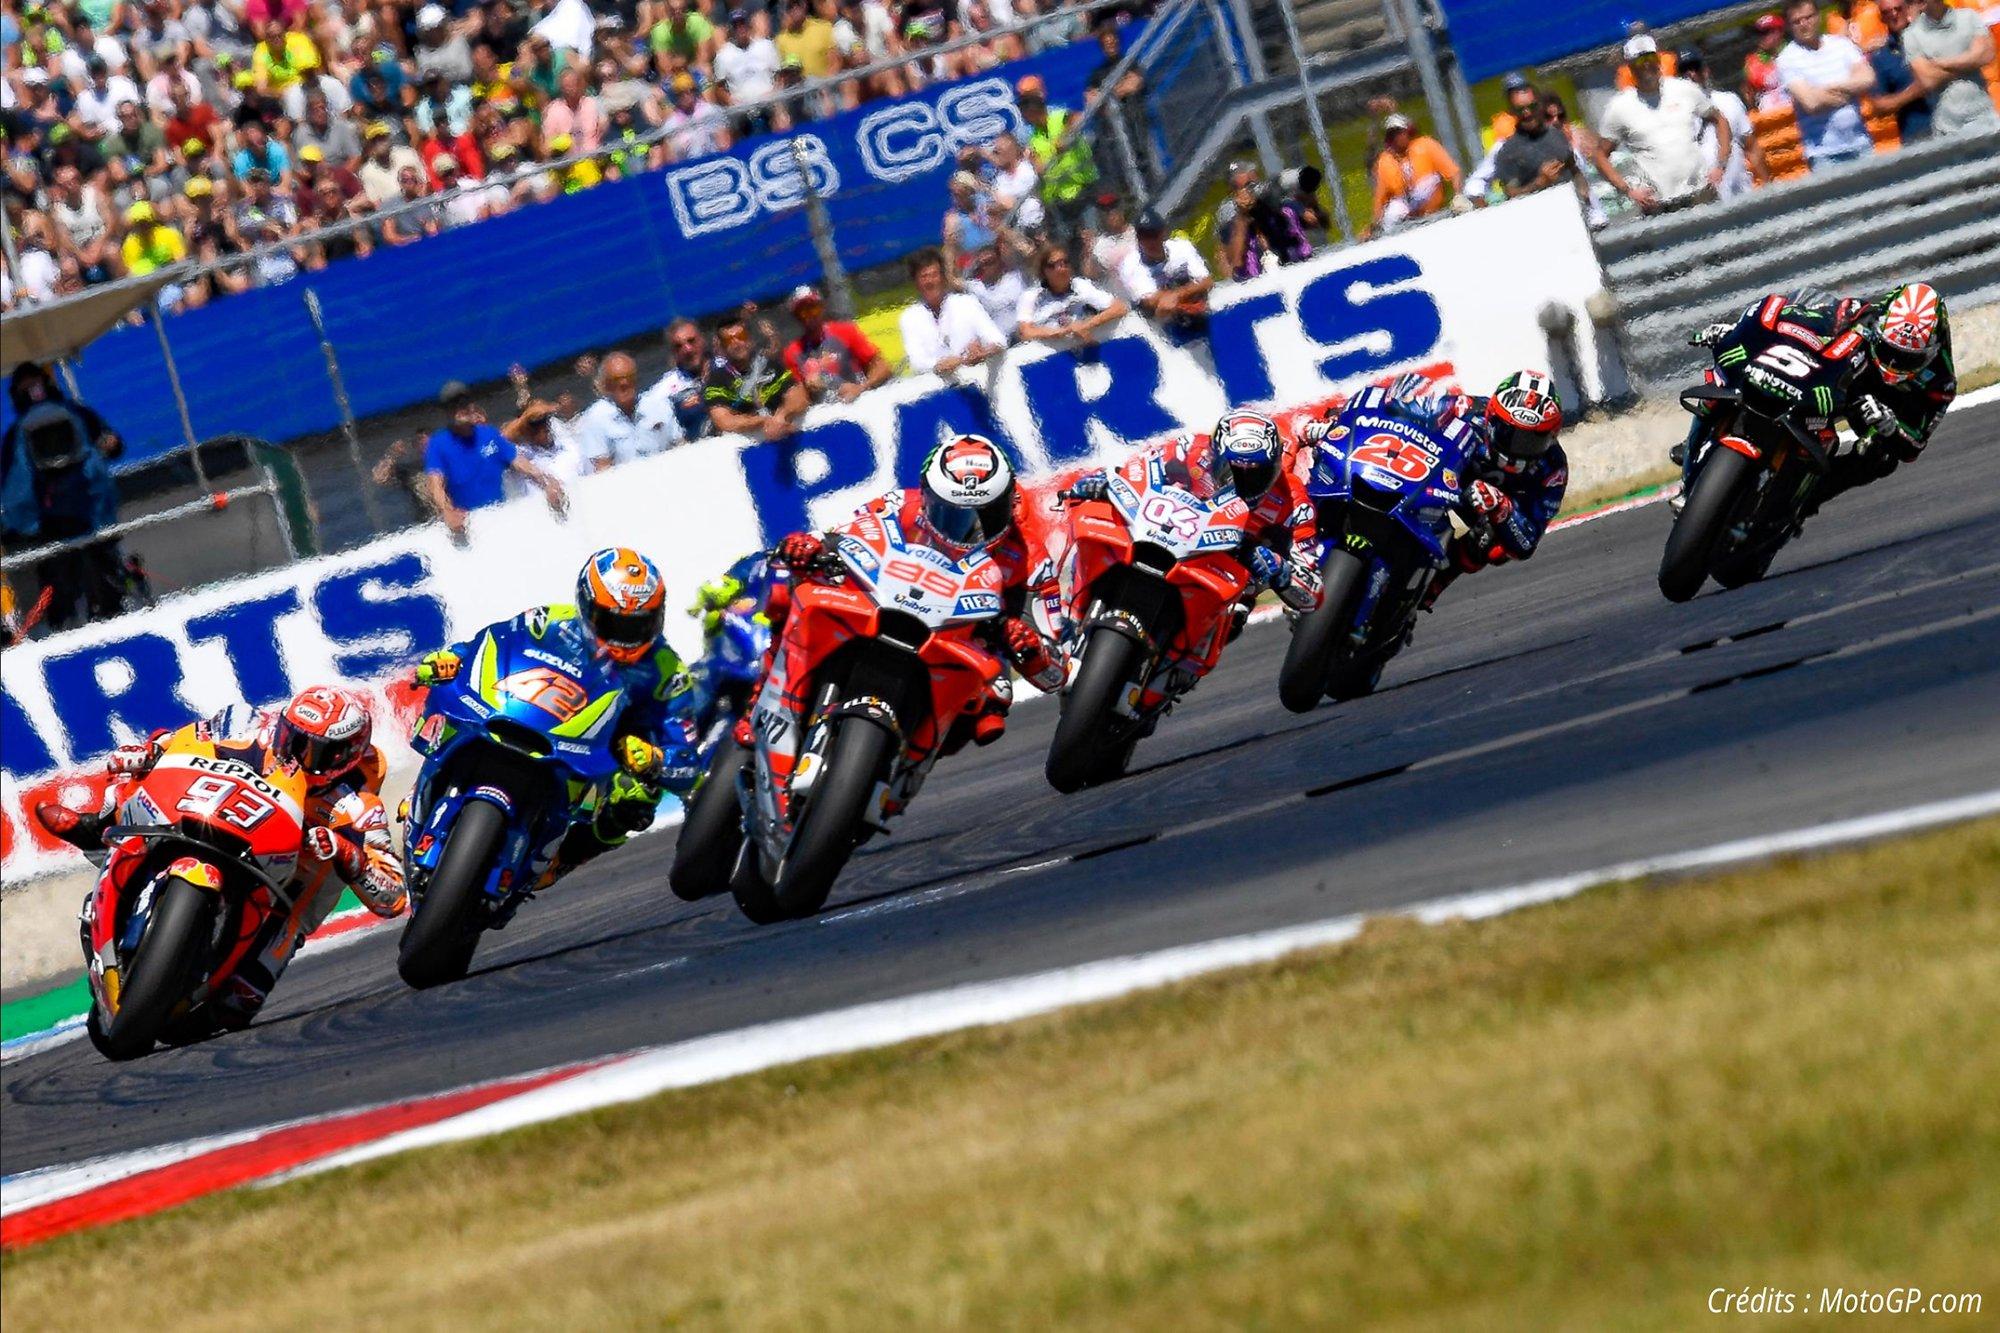 MotoGP vs WorldSBK